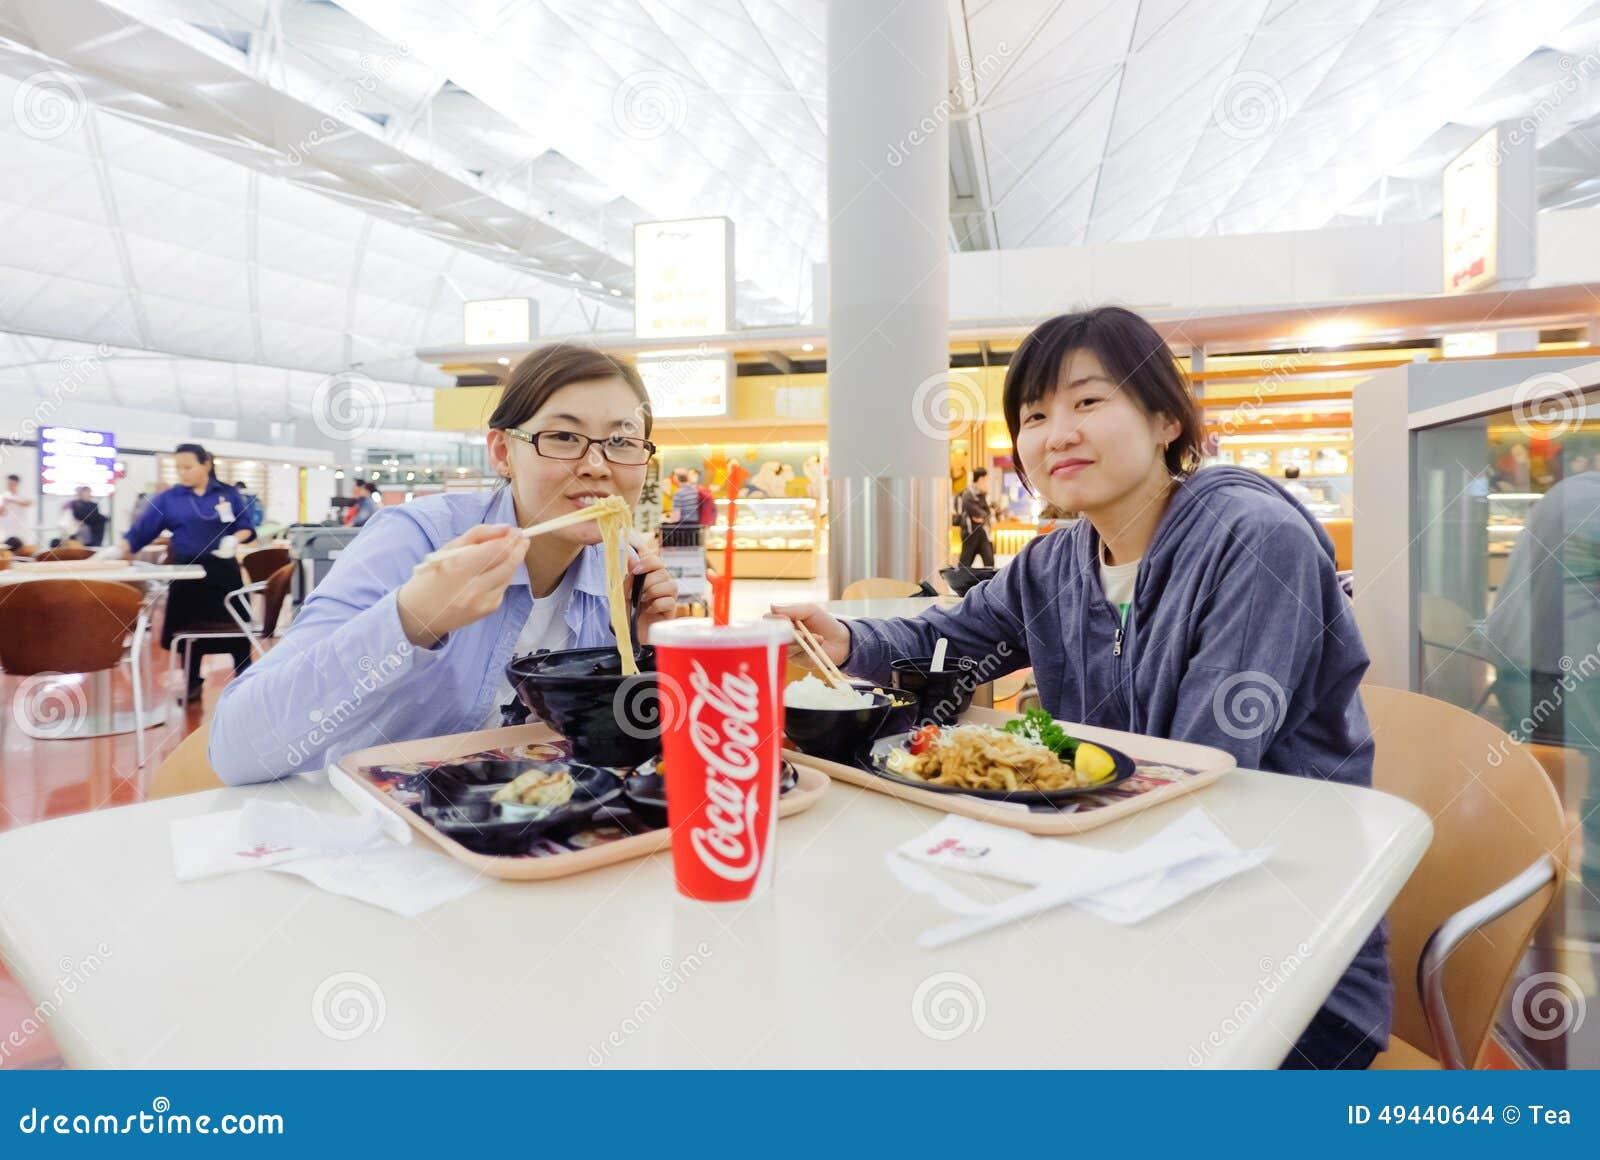 Food To Eat In Hong Kong Airport